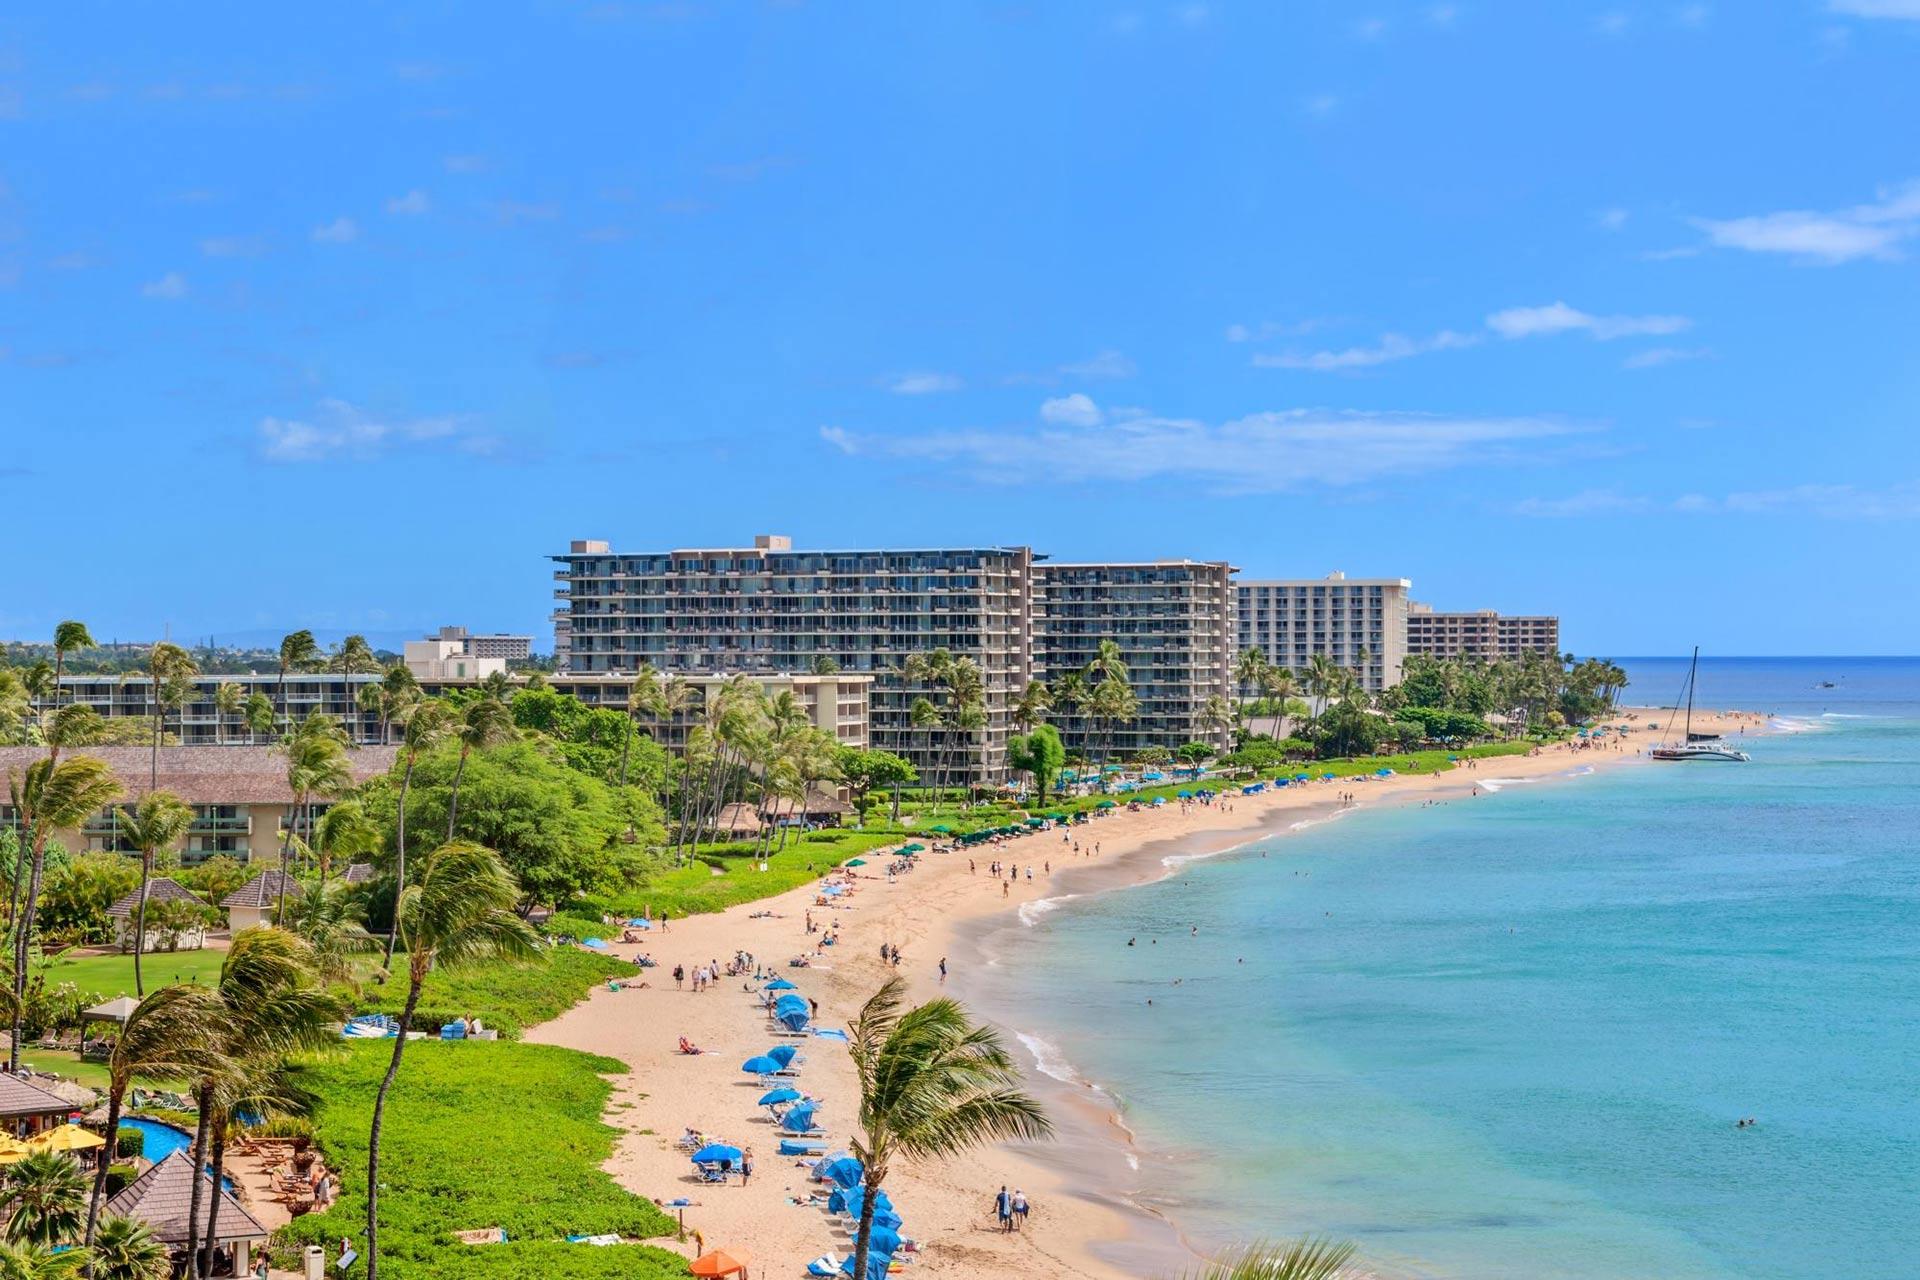 Ka'anapali Beach Hotel in Maui